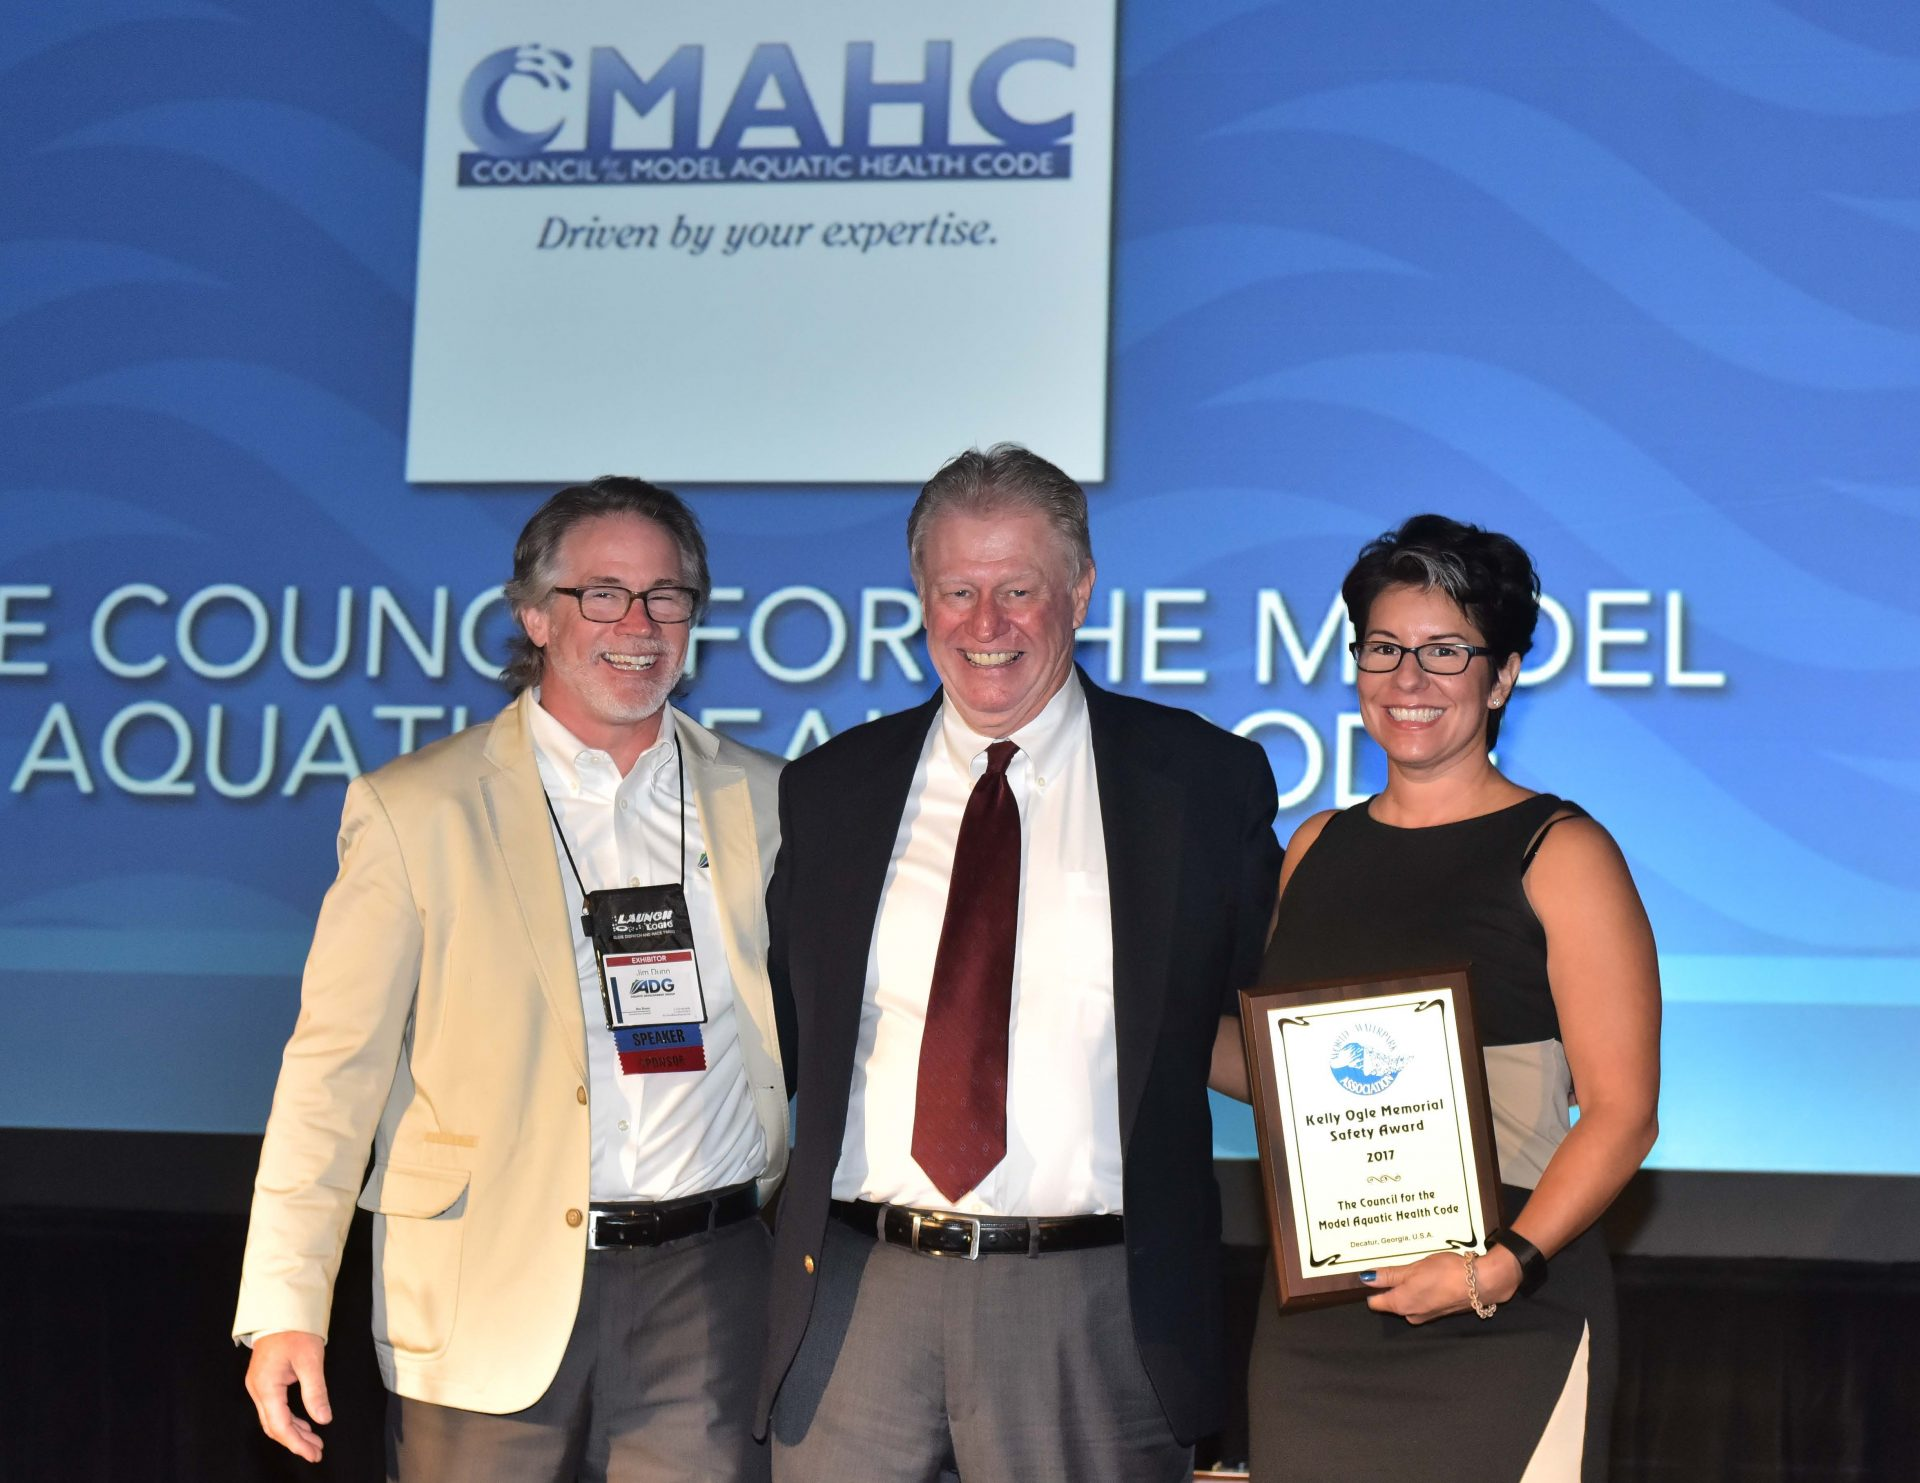 cmahc award jim dunn aquatic development group